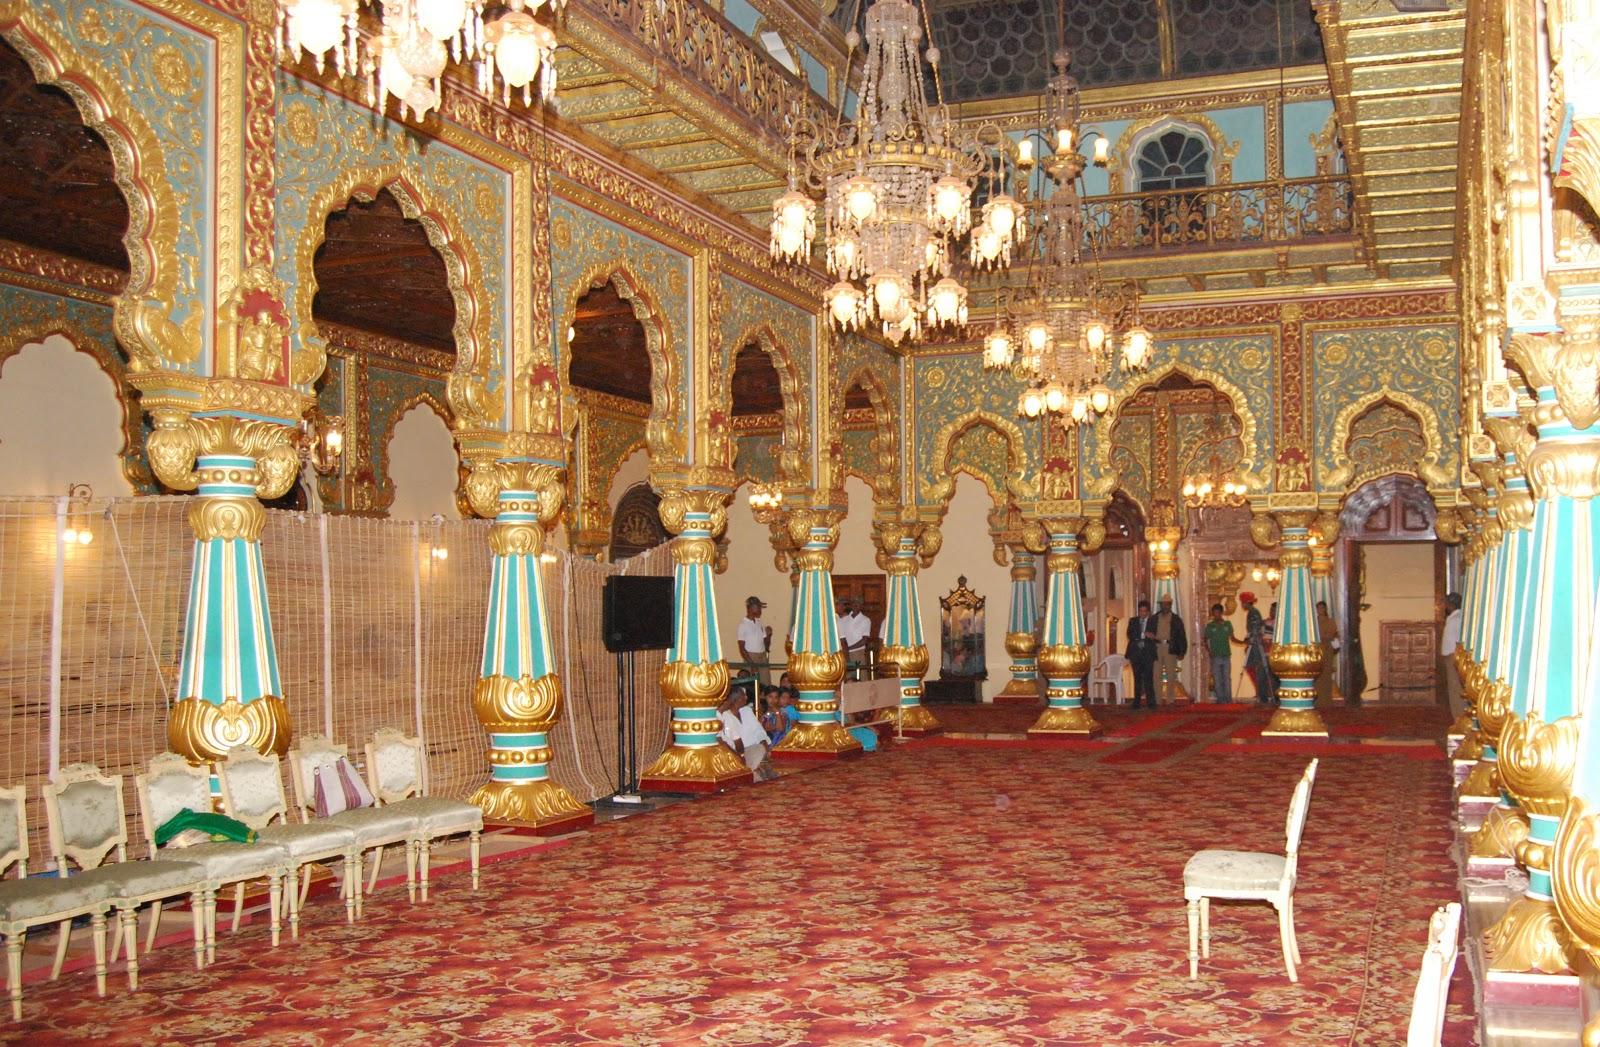 Ideas 70 of Mysore Palace Interior Images